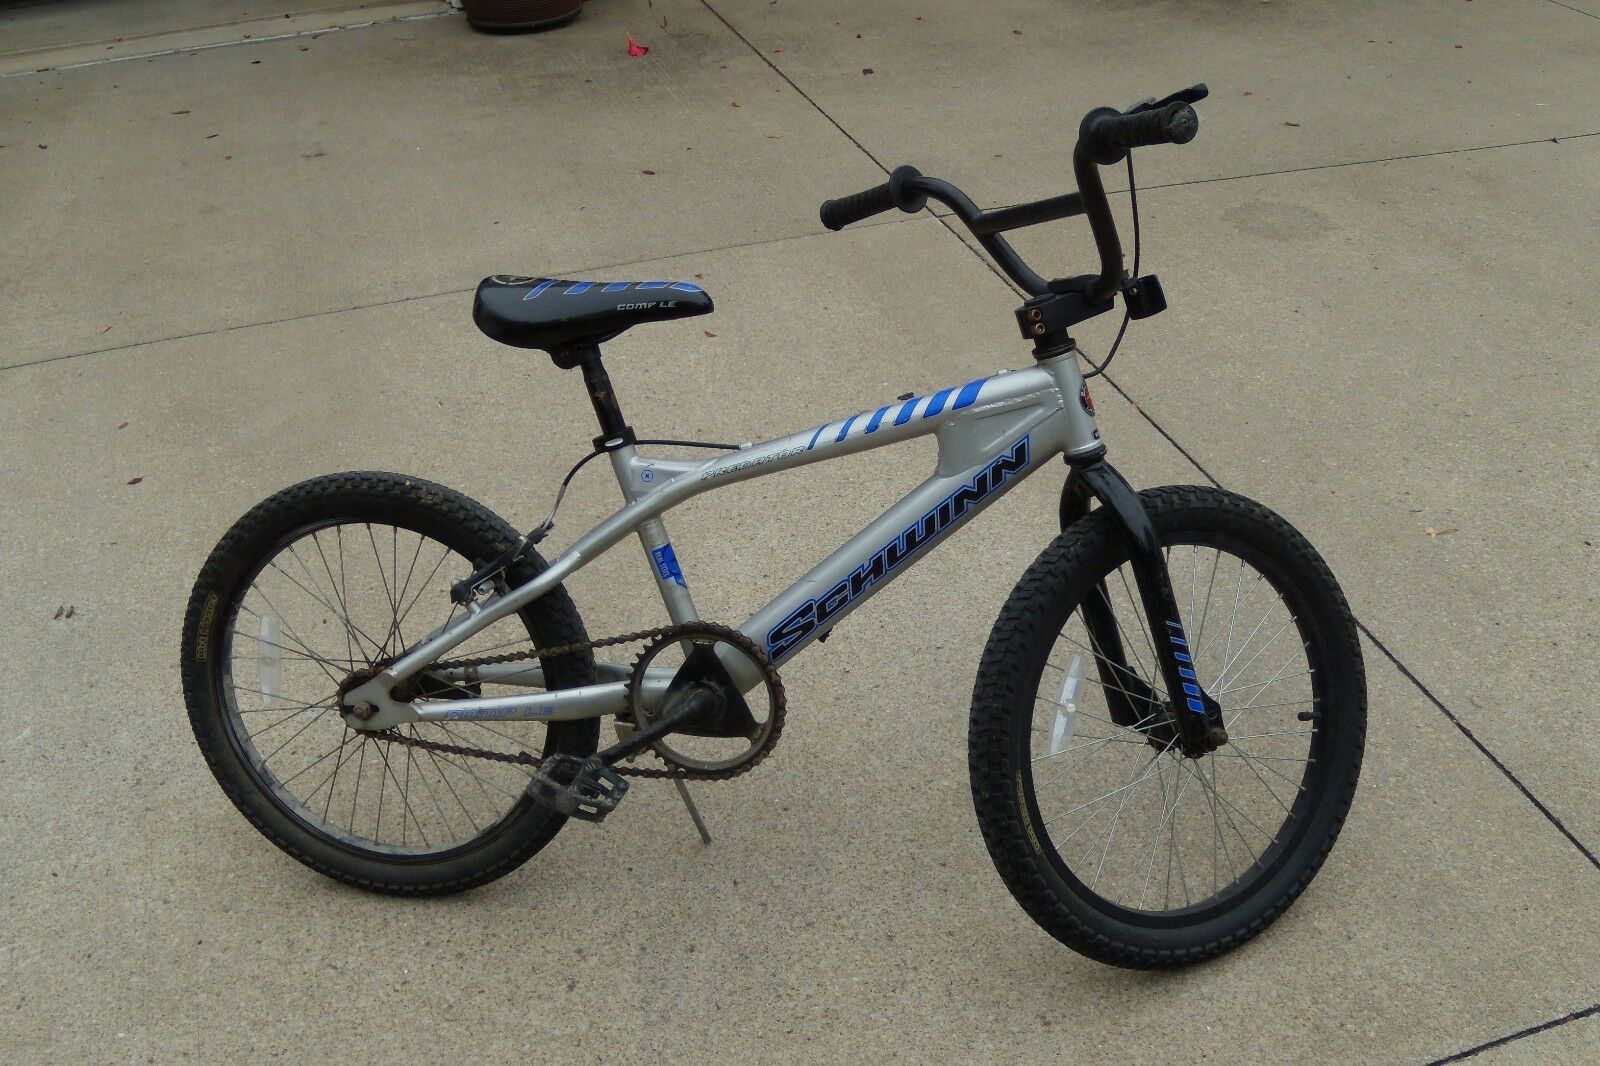 Schwinn  Predator bmx Bike 20  Wheels  fantastic quality